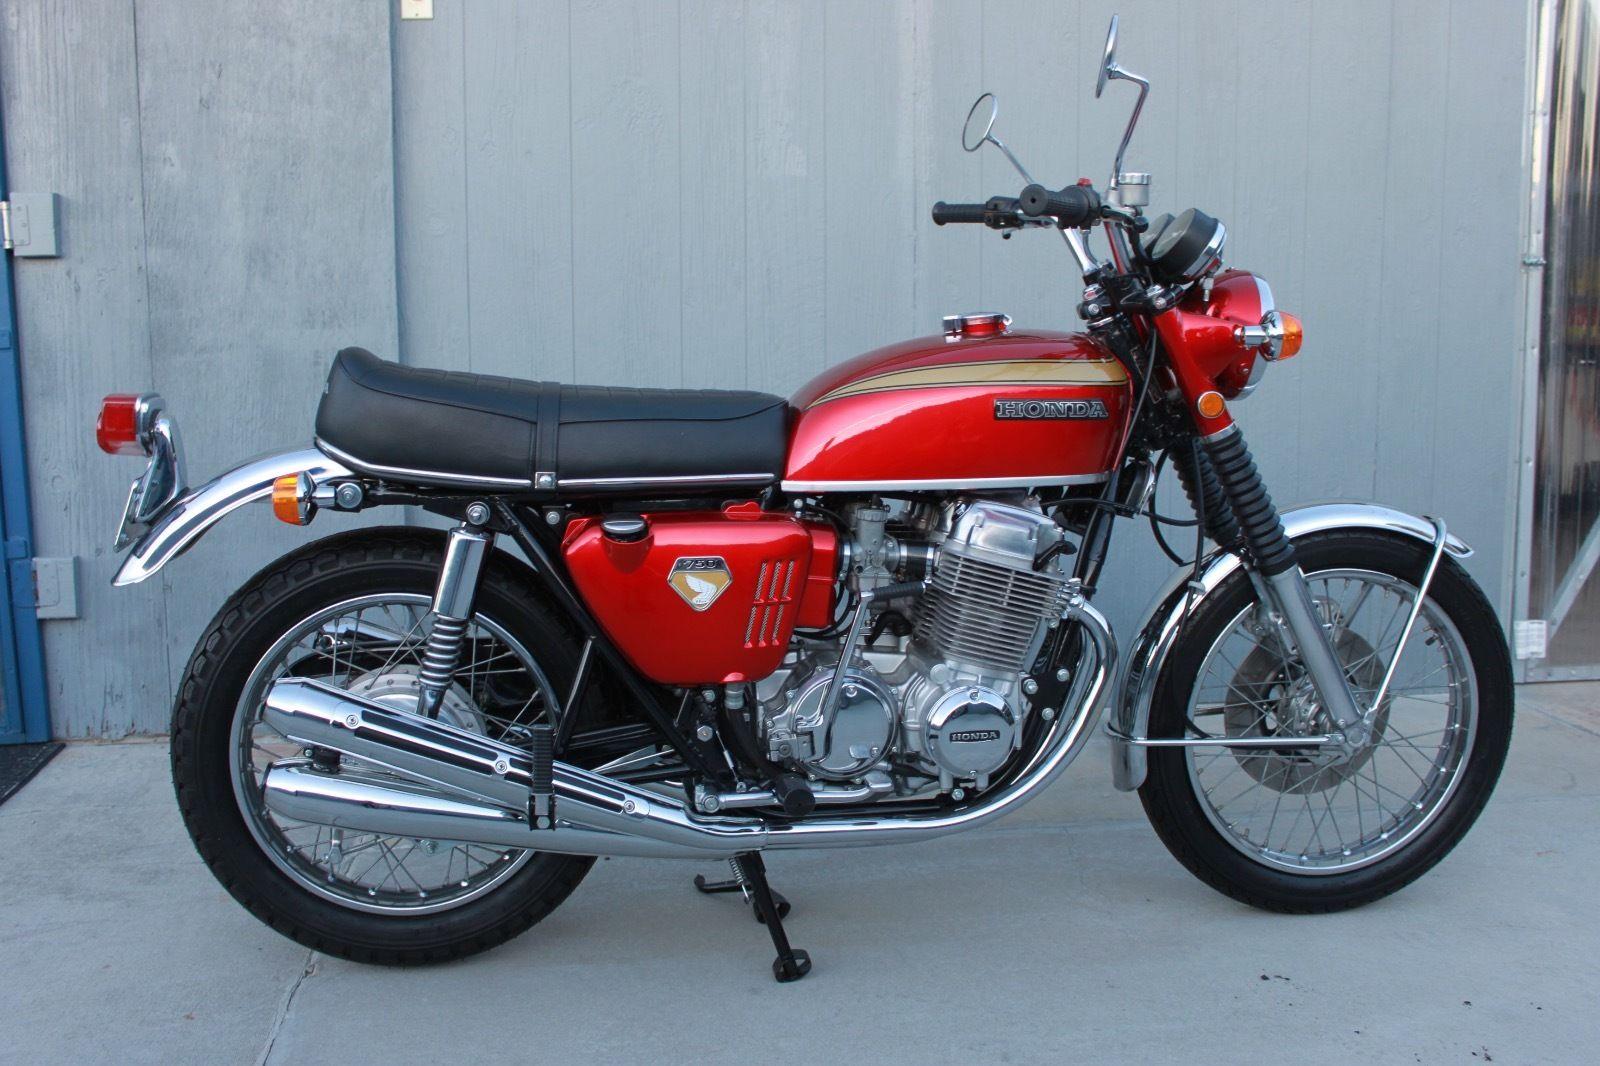 restored honda cb750 1970 photographs at classic bikes restored bikes restored. Black Bedroom Furniture Sets. Home Design Ideas